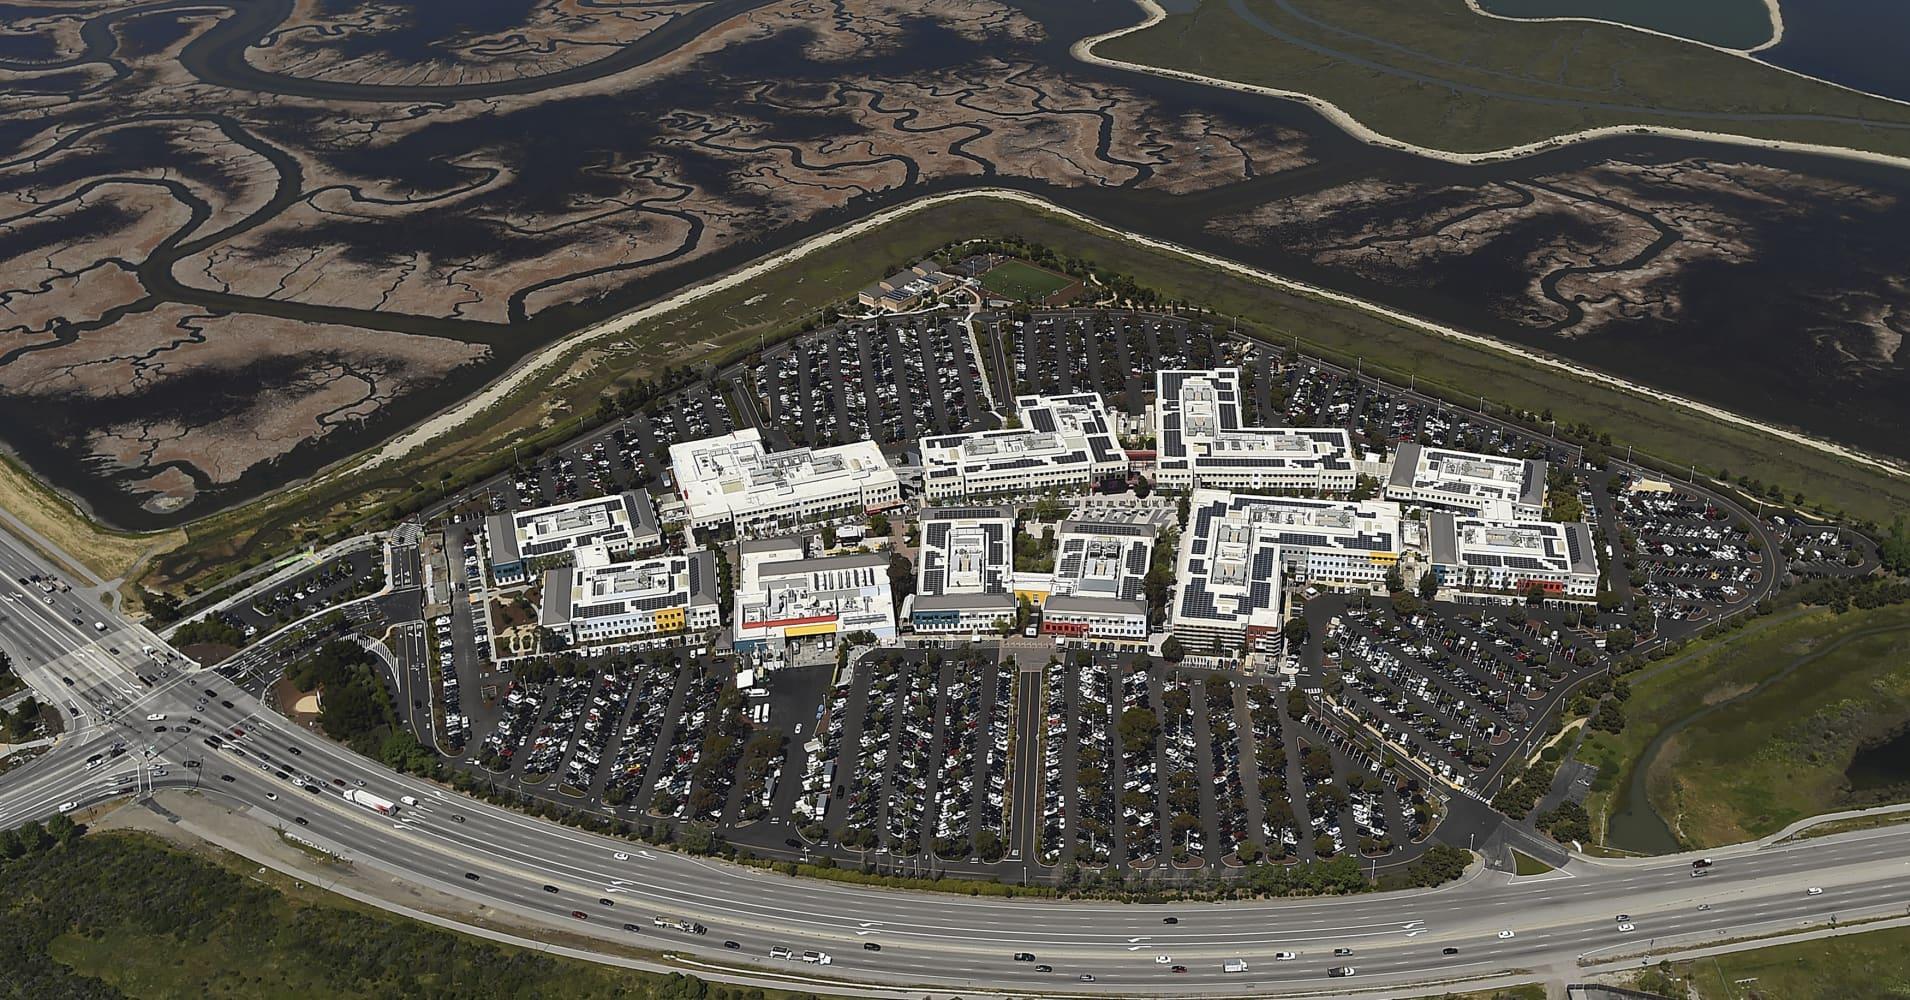 The Facebook campus in Menlo Park, California.